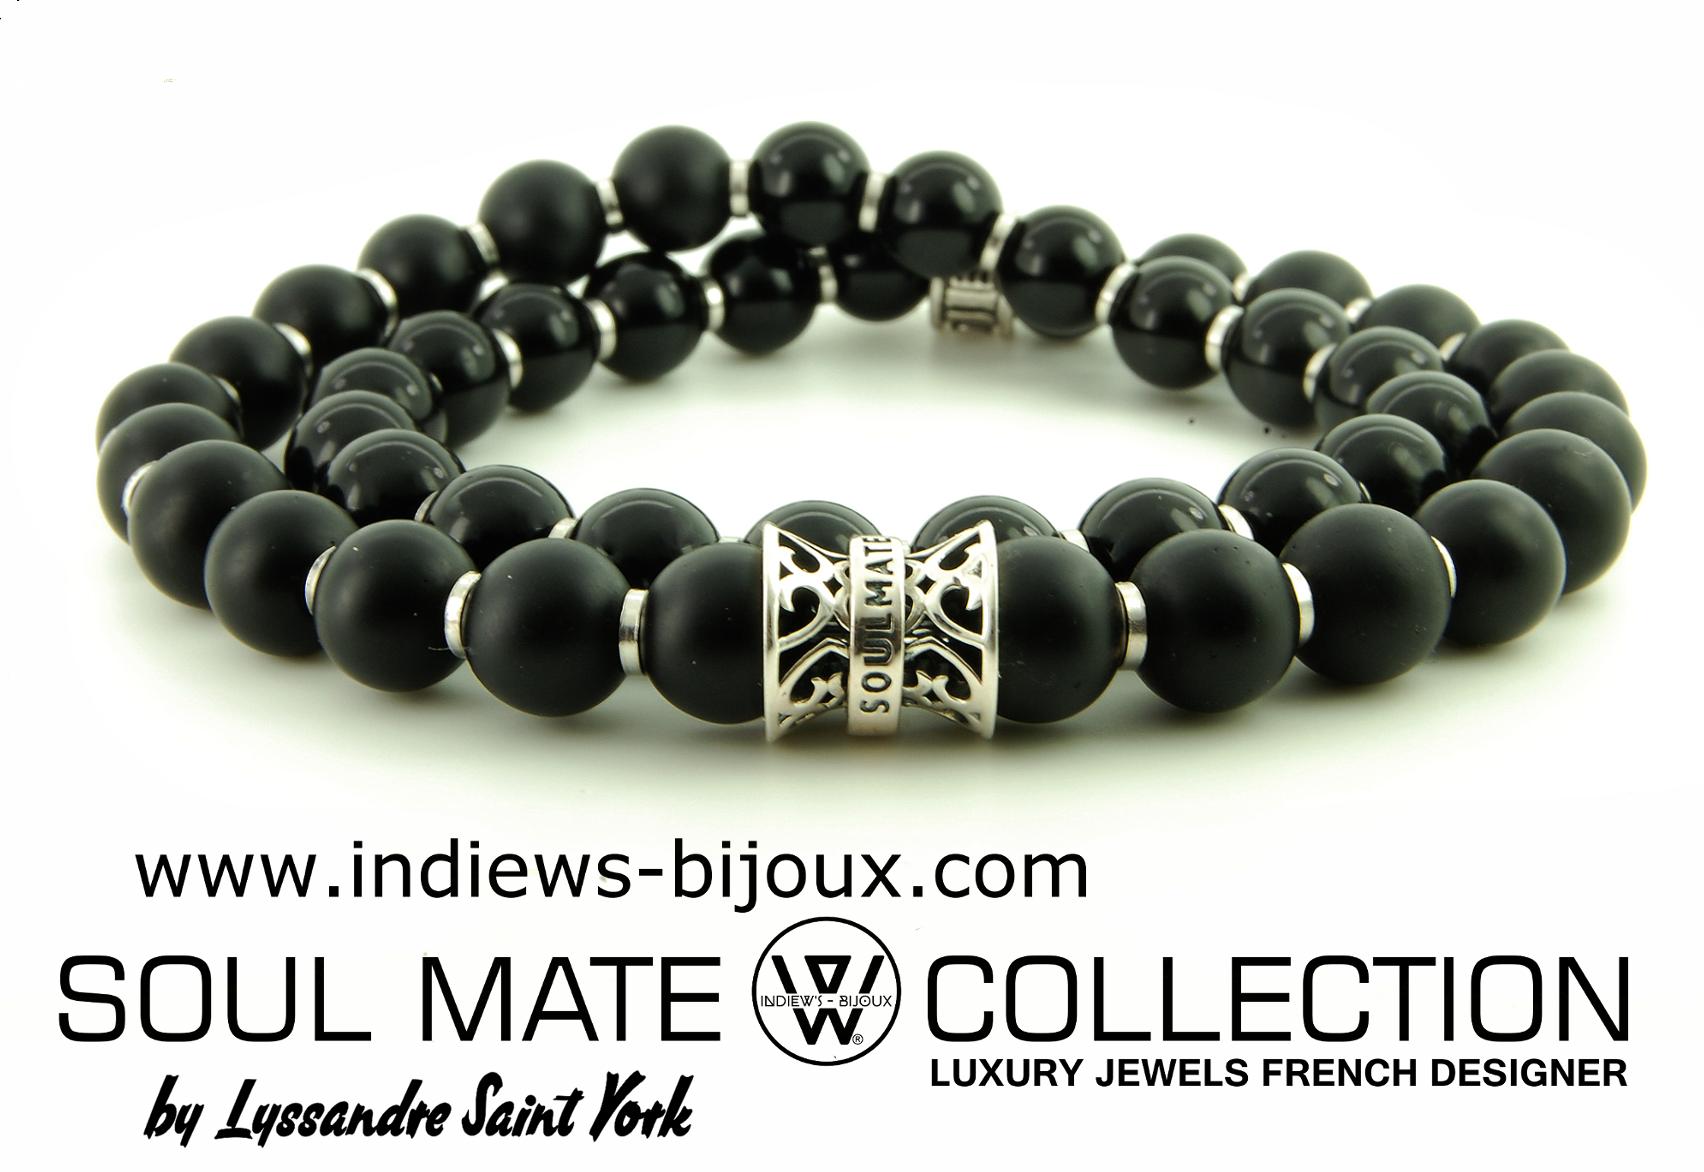 bracelet homme collection luxe argent bracelet homme perle indiews bijoux. Black Bedroom Furniture Sets. Home Design Ideas